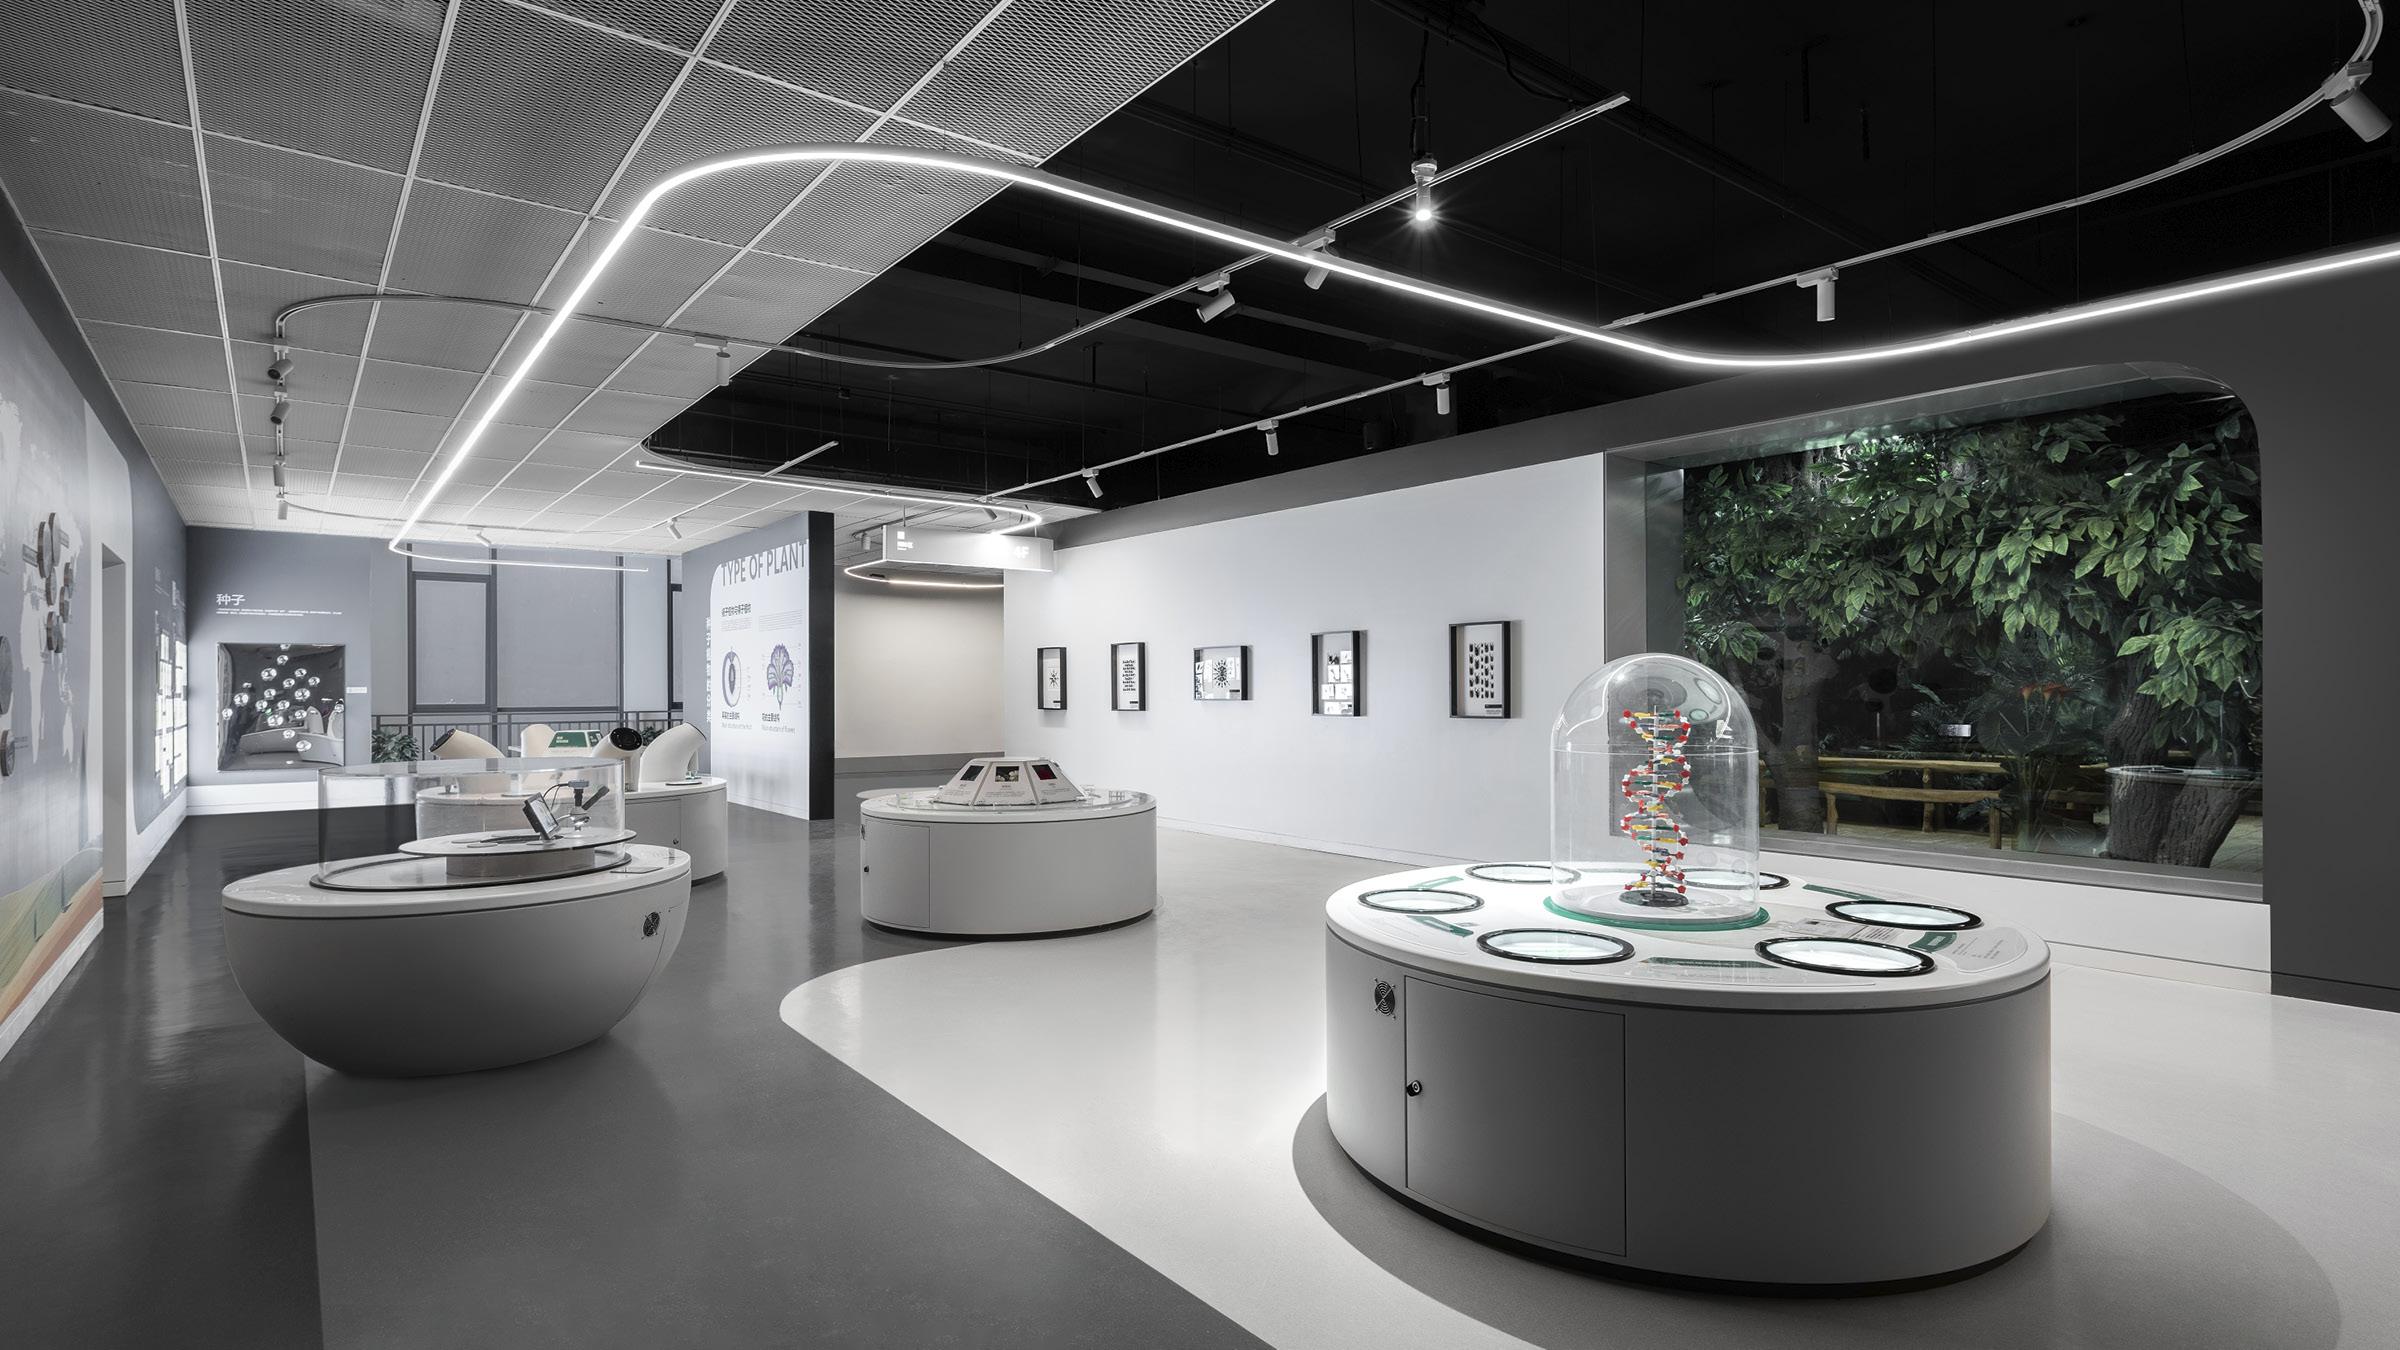 atelier one and many-壹和万象-博物馆-室内设计11